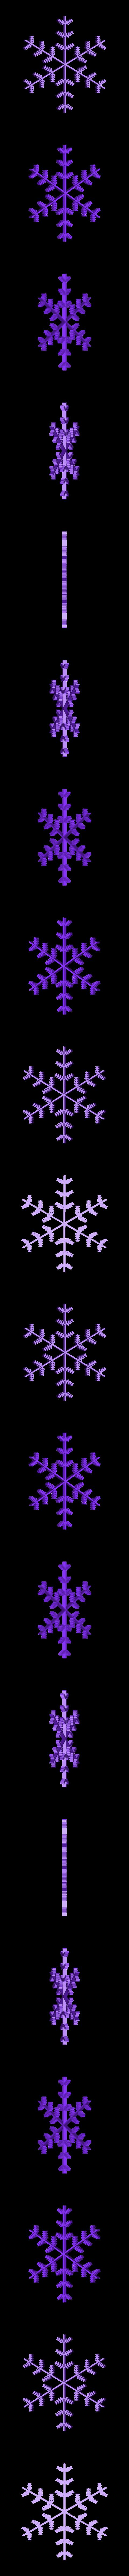 snowflake14.stl Download free STL file Random fractal snowflake in BlocksCAD • 3D printer model, arpruss